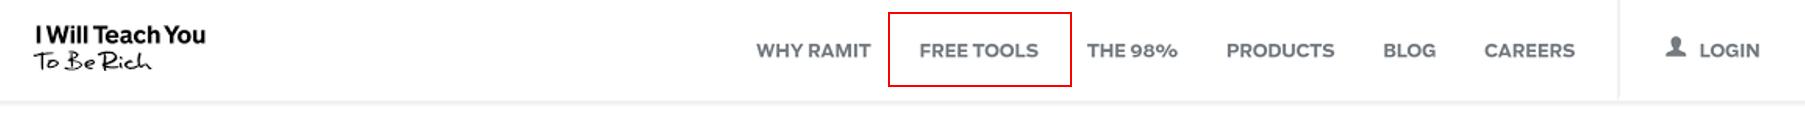 Free tools menu item